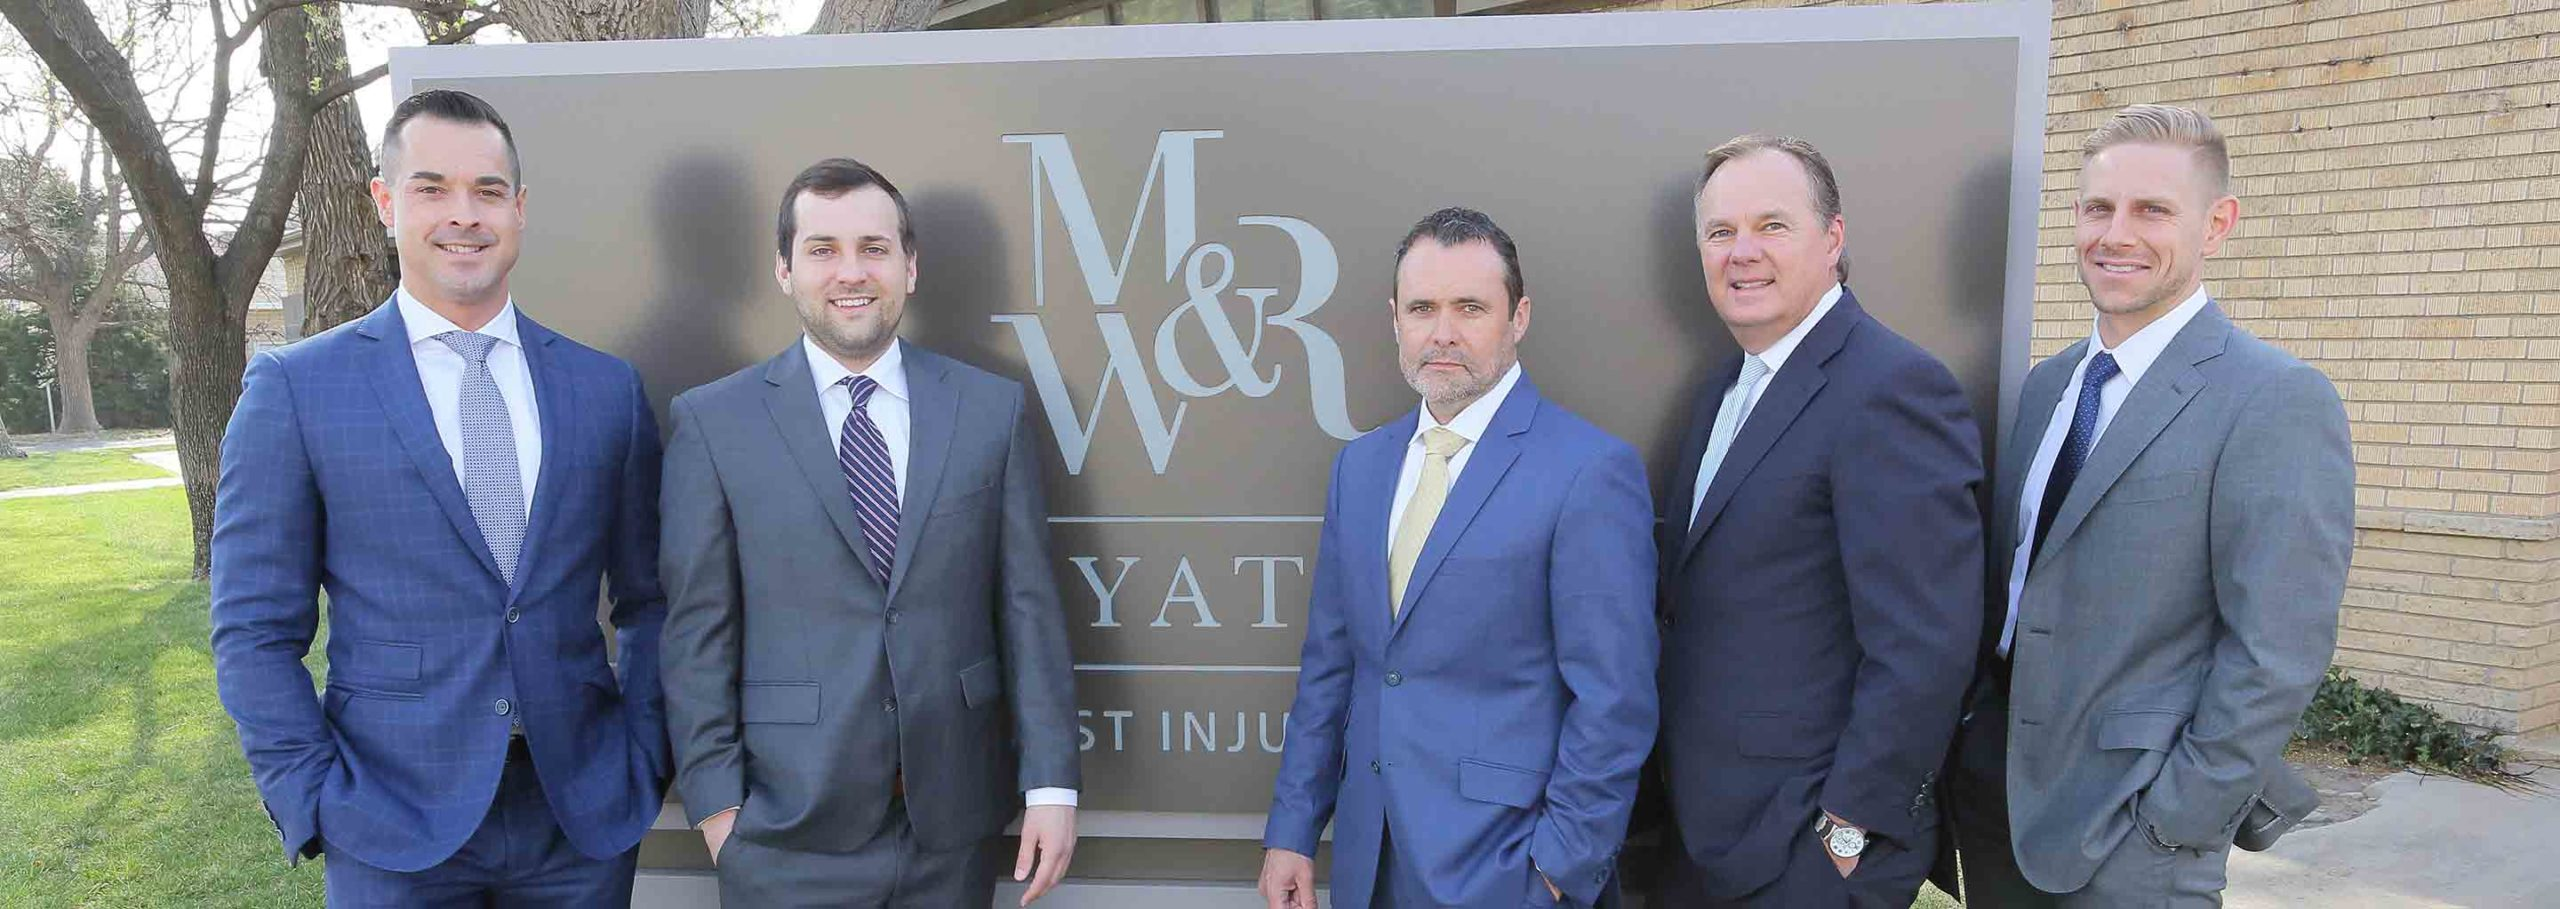 mann wyatt & rice team photo